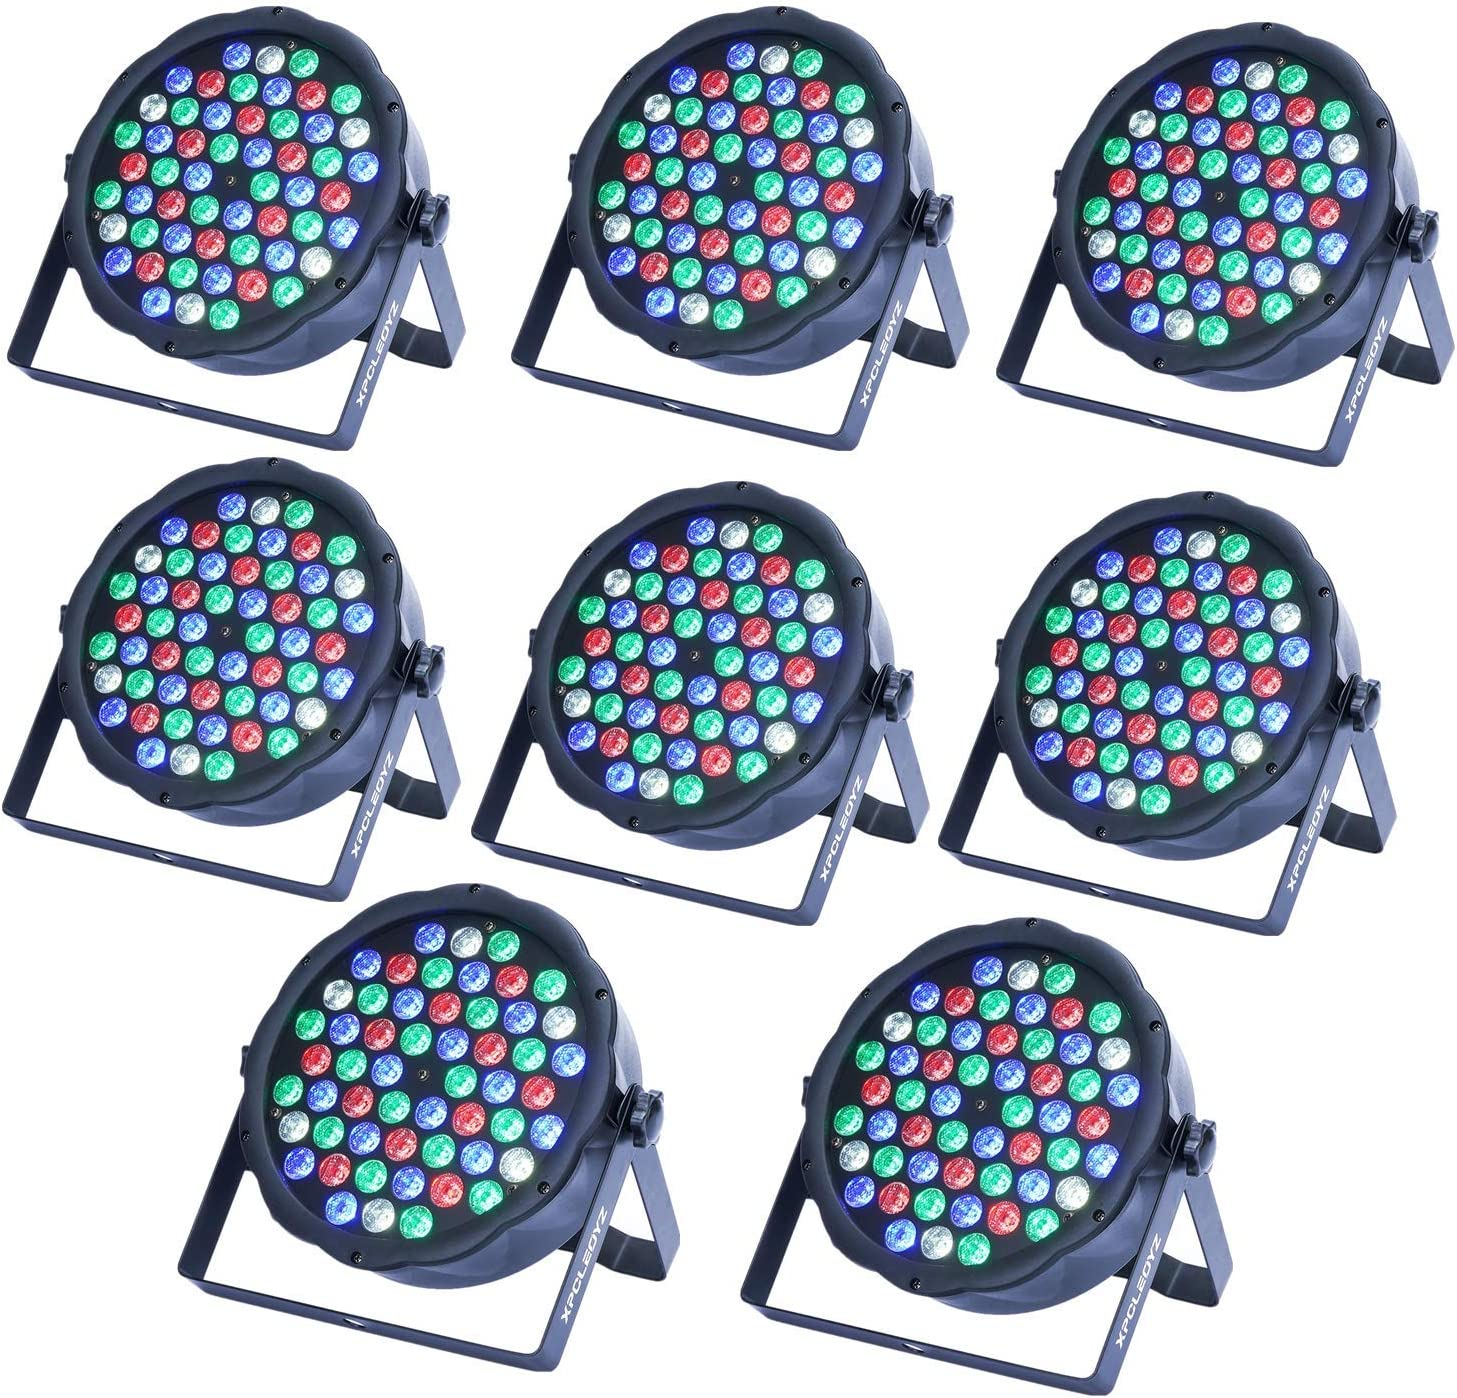 LED Stage Lights XPCLEOYZ 54x3W LED Par Light RGBW 162Watt DMX 512 Stage Lighting for Home Party Wedding DJ Show Club Concert Dance Floor Lighting - 4 Pack … (8PCS)